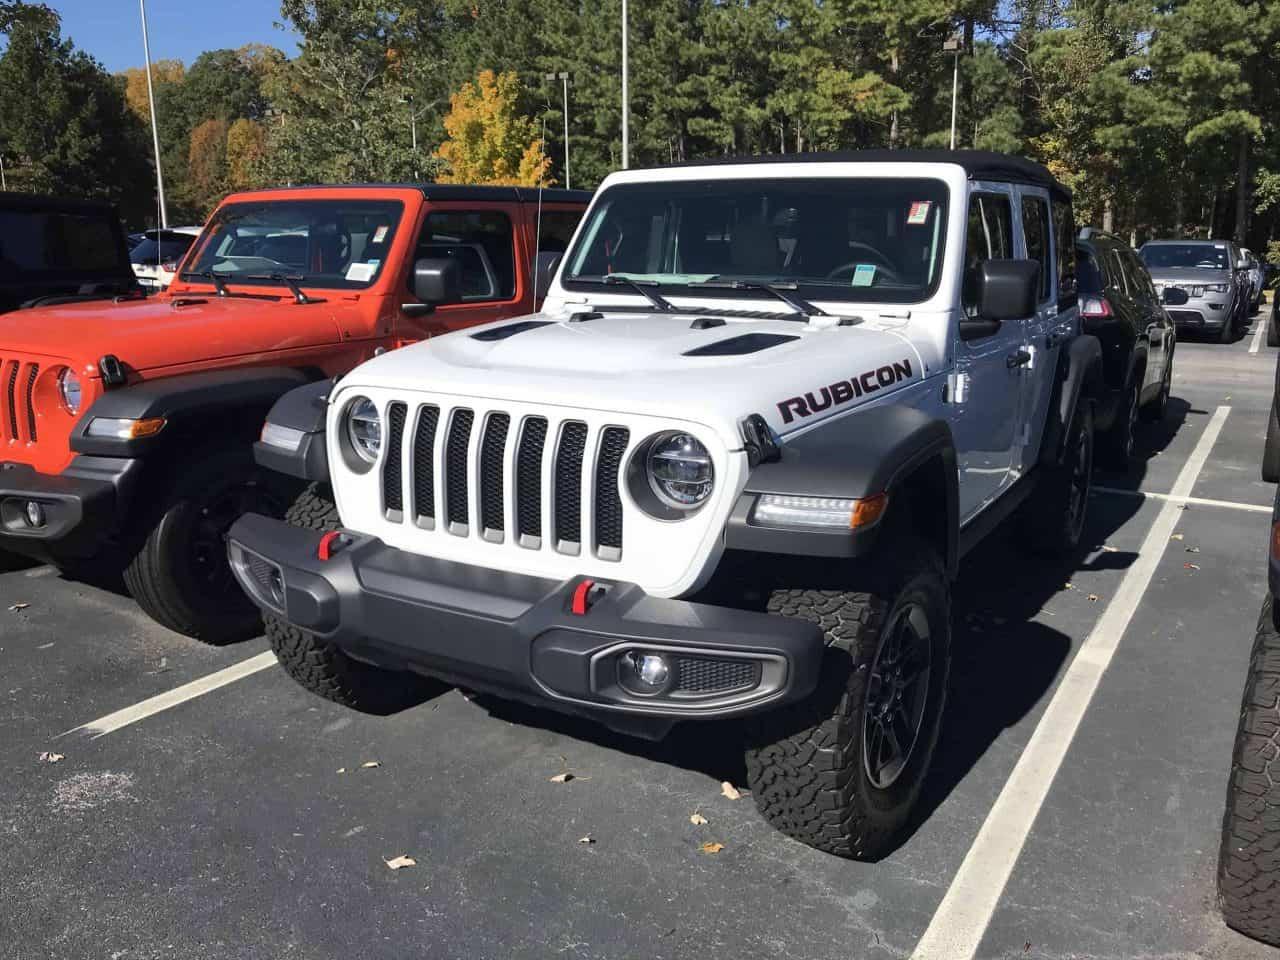 Best Price for a Jeep Wrangler #JeepLife #Wrangler